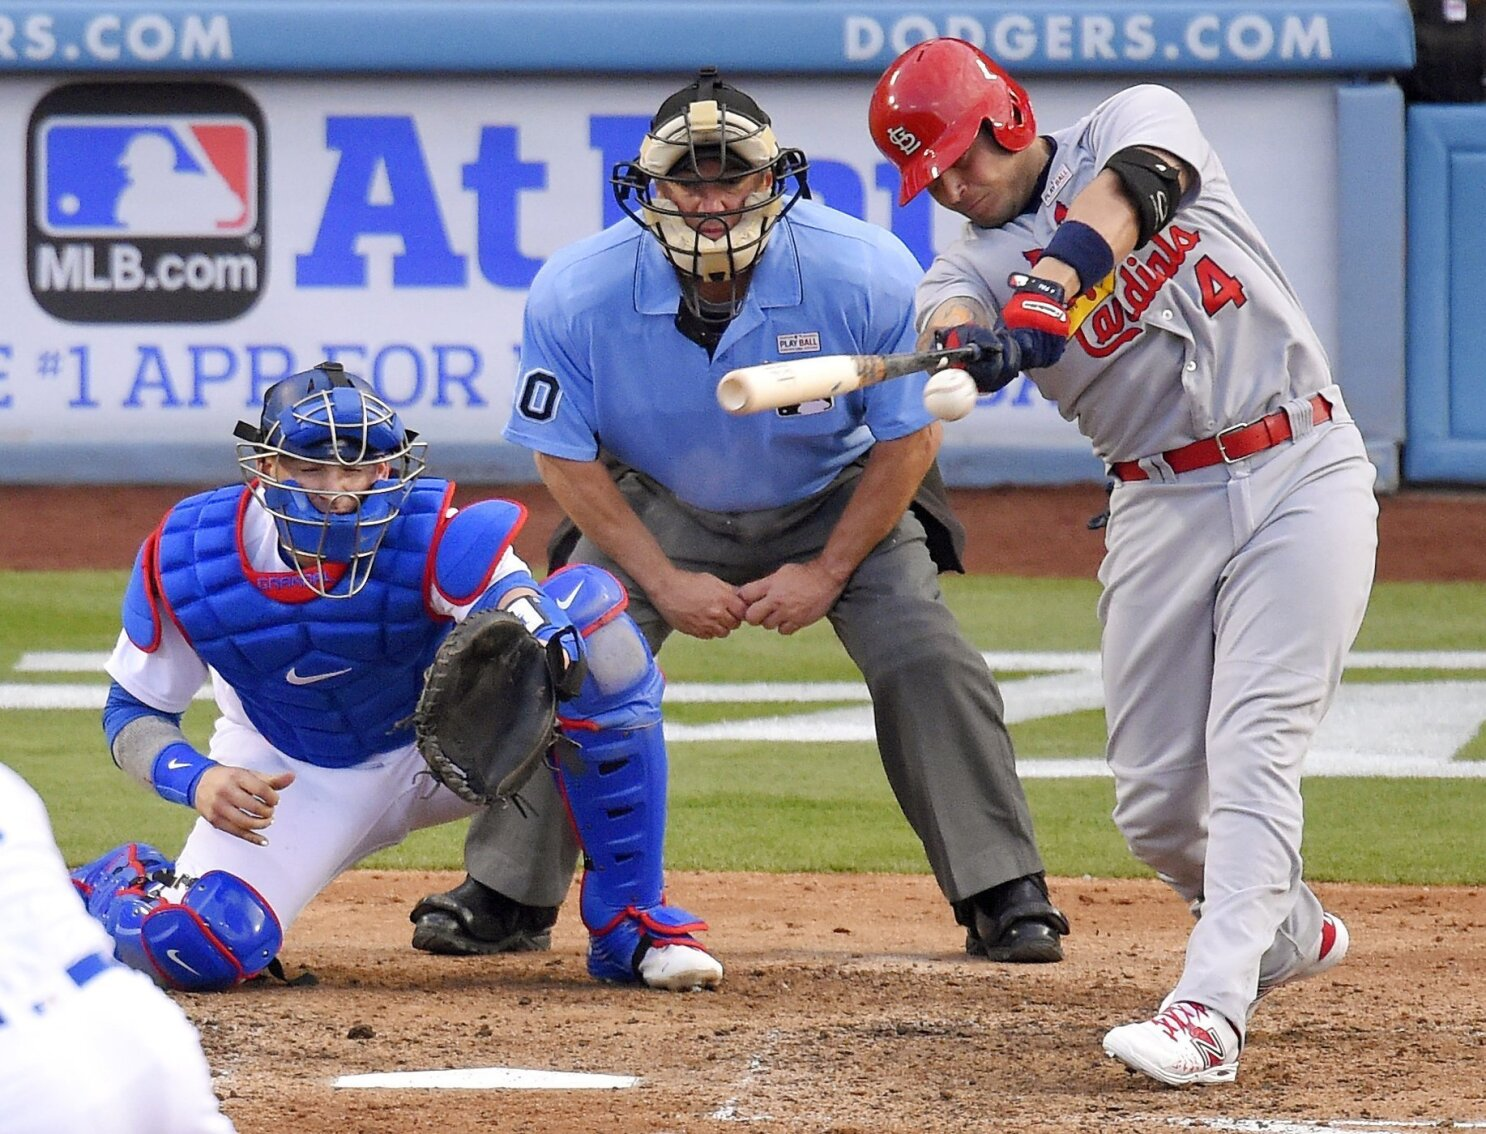 af3f8b33 Dodgers bullpen struggles again in 5-2 loss to Cardinals - The San ...